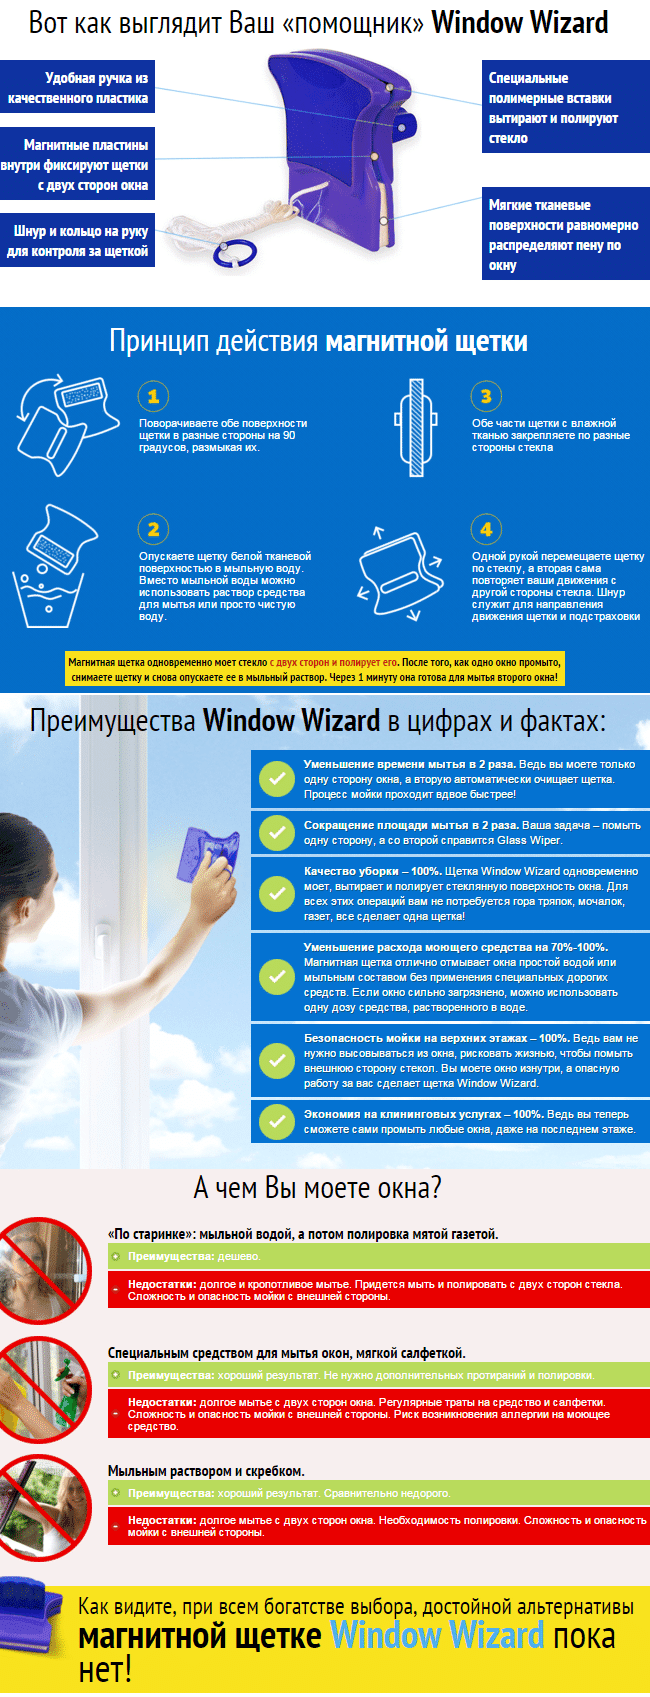 щетка Window Wizard купить